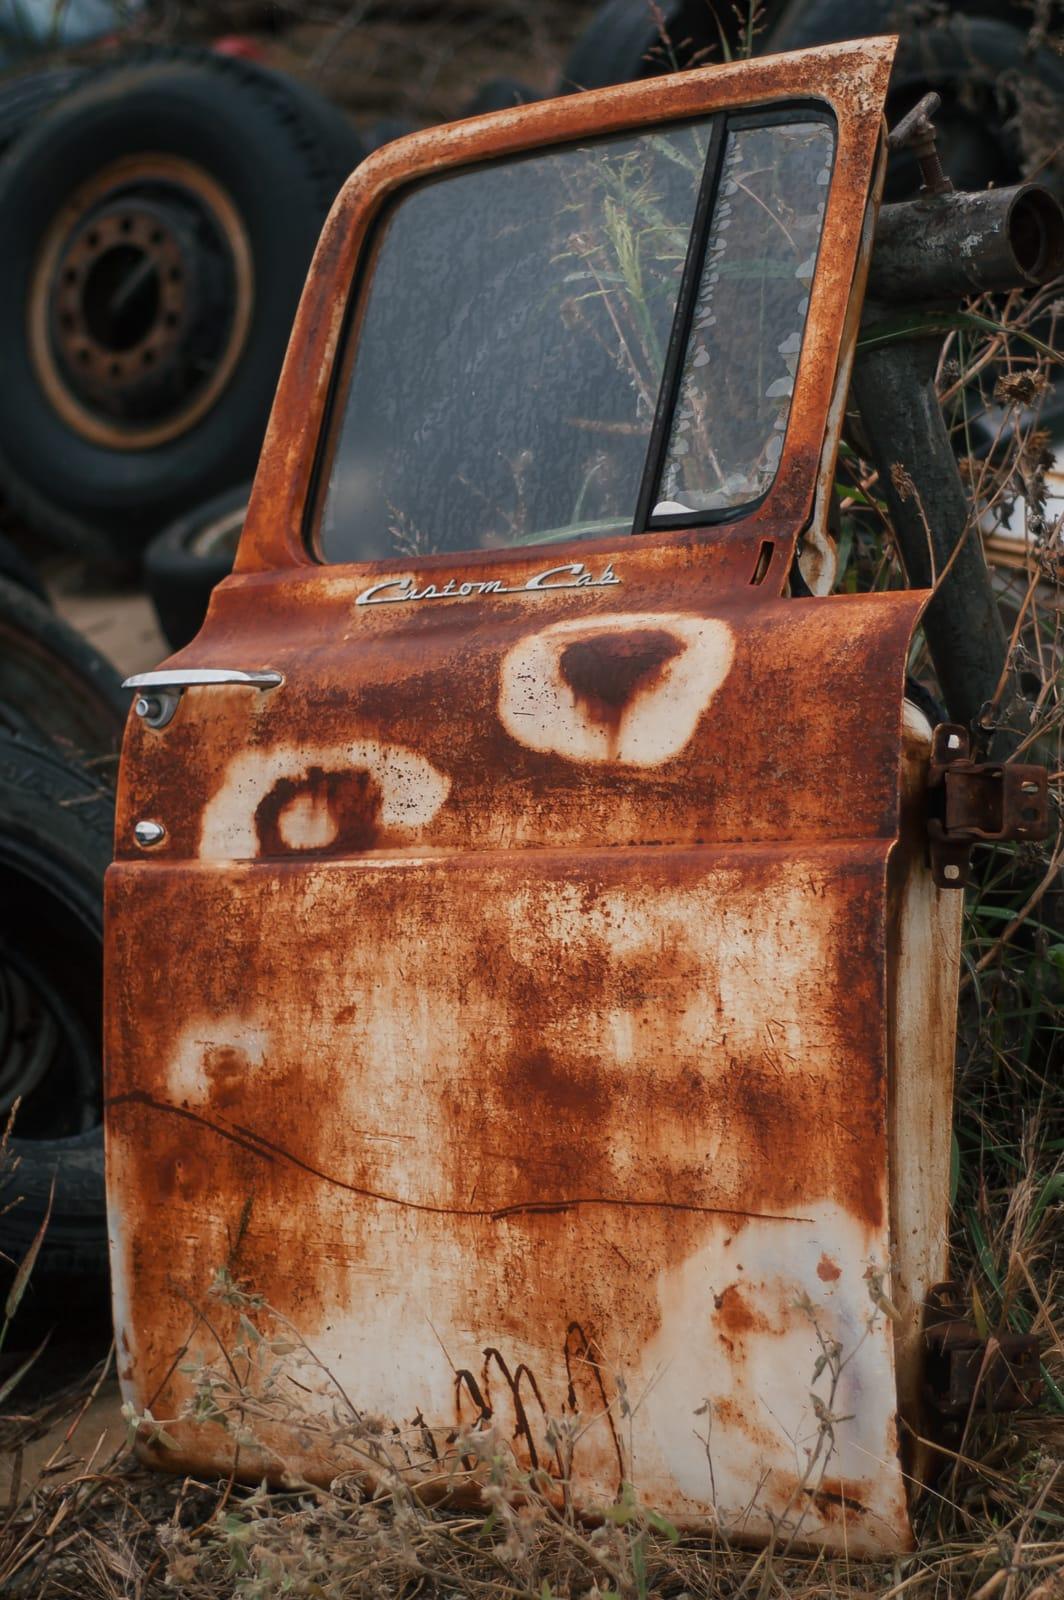 Urban Exploring An Abandoned Junkyard